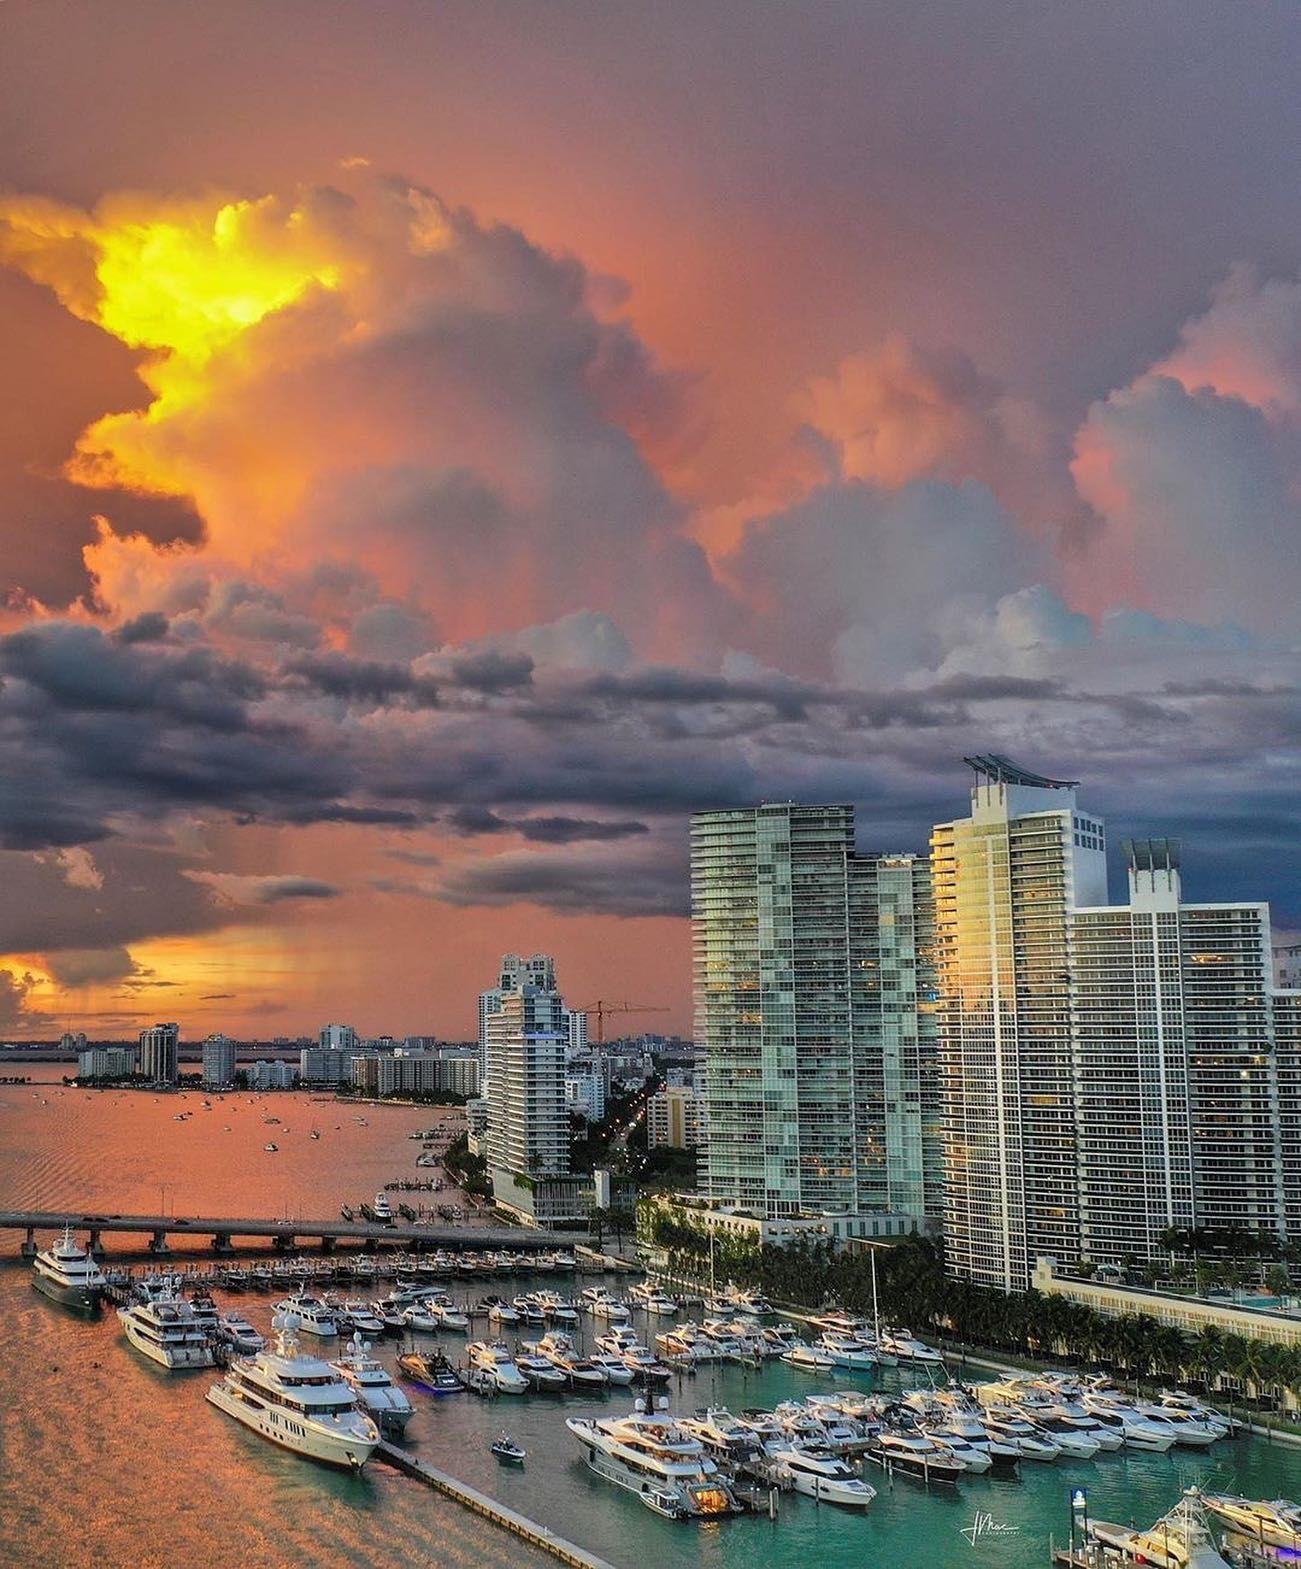 Nothing like a Miami sunset    @jasonmac7  #southbeachmiami #miamiguide #miamilife #miamirealtor #miamiart #miamistyle #miamidolphins #Miamiliving #miamibeachlife #miamibeachliving #miamibeachparty #miamibeachrealtor #miamibeaches #miamibeachcondos #miamiskyline #miamivibes #miamibeach #miami #miamisunset #sunsetlover #sunsetmadness #sunsetphotography